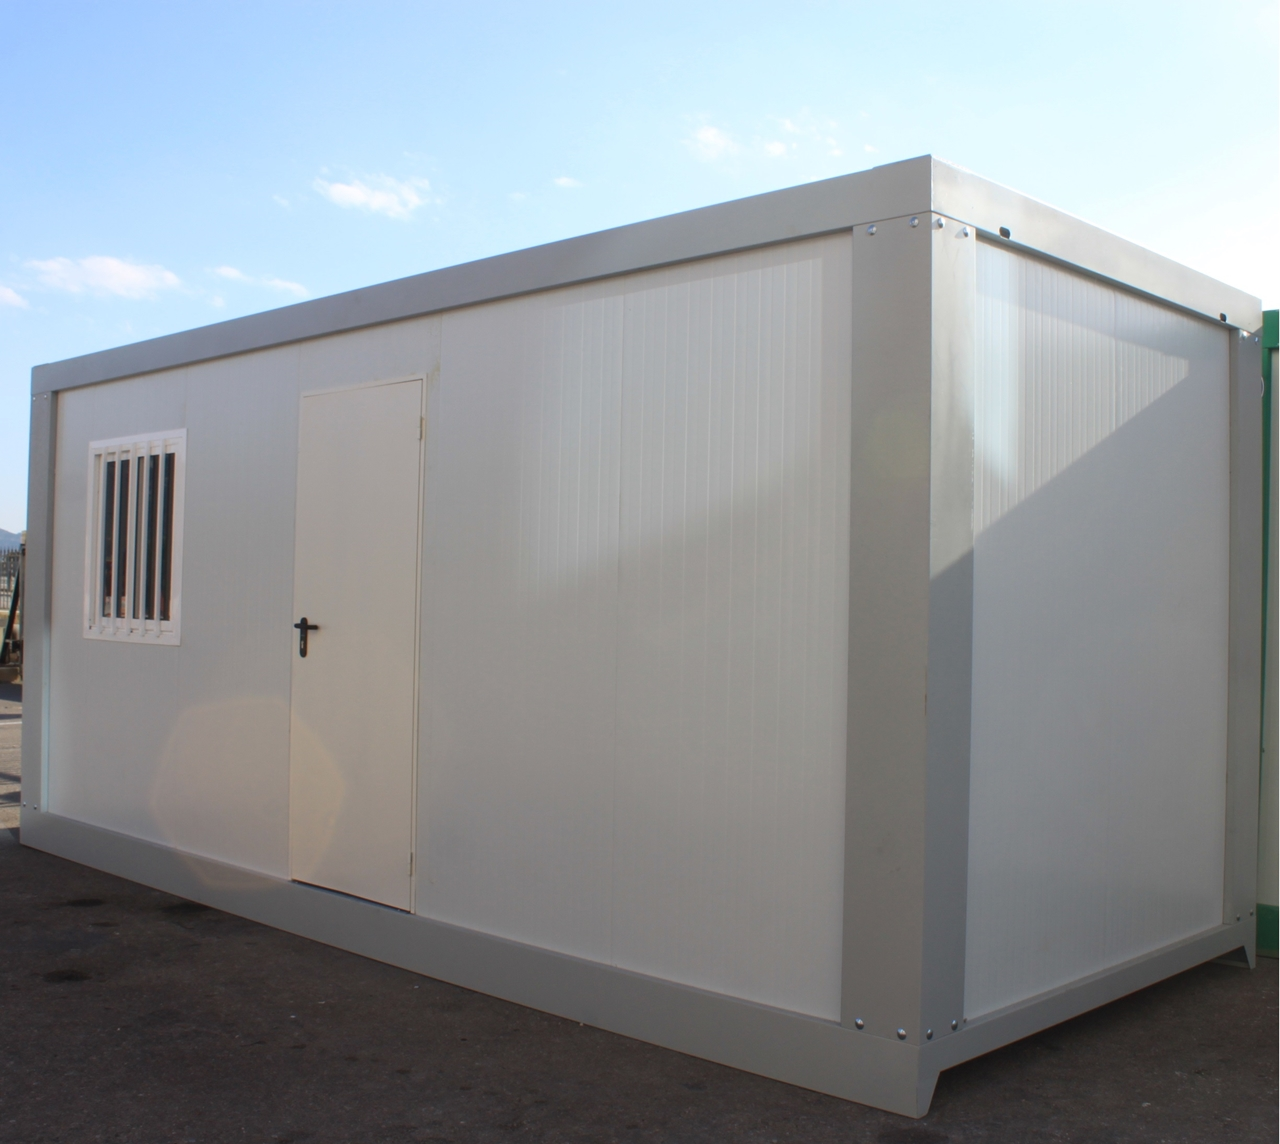 Caseta prefabricada di fana 6 metros globen for Casetas de obra baratas